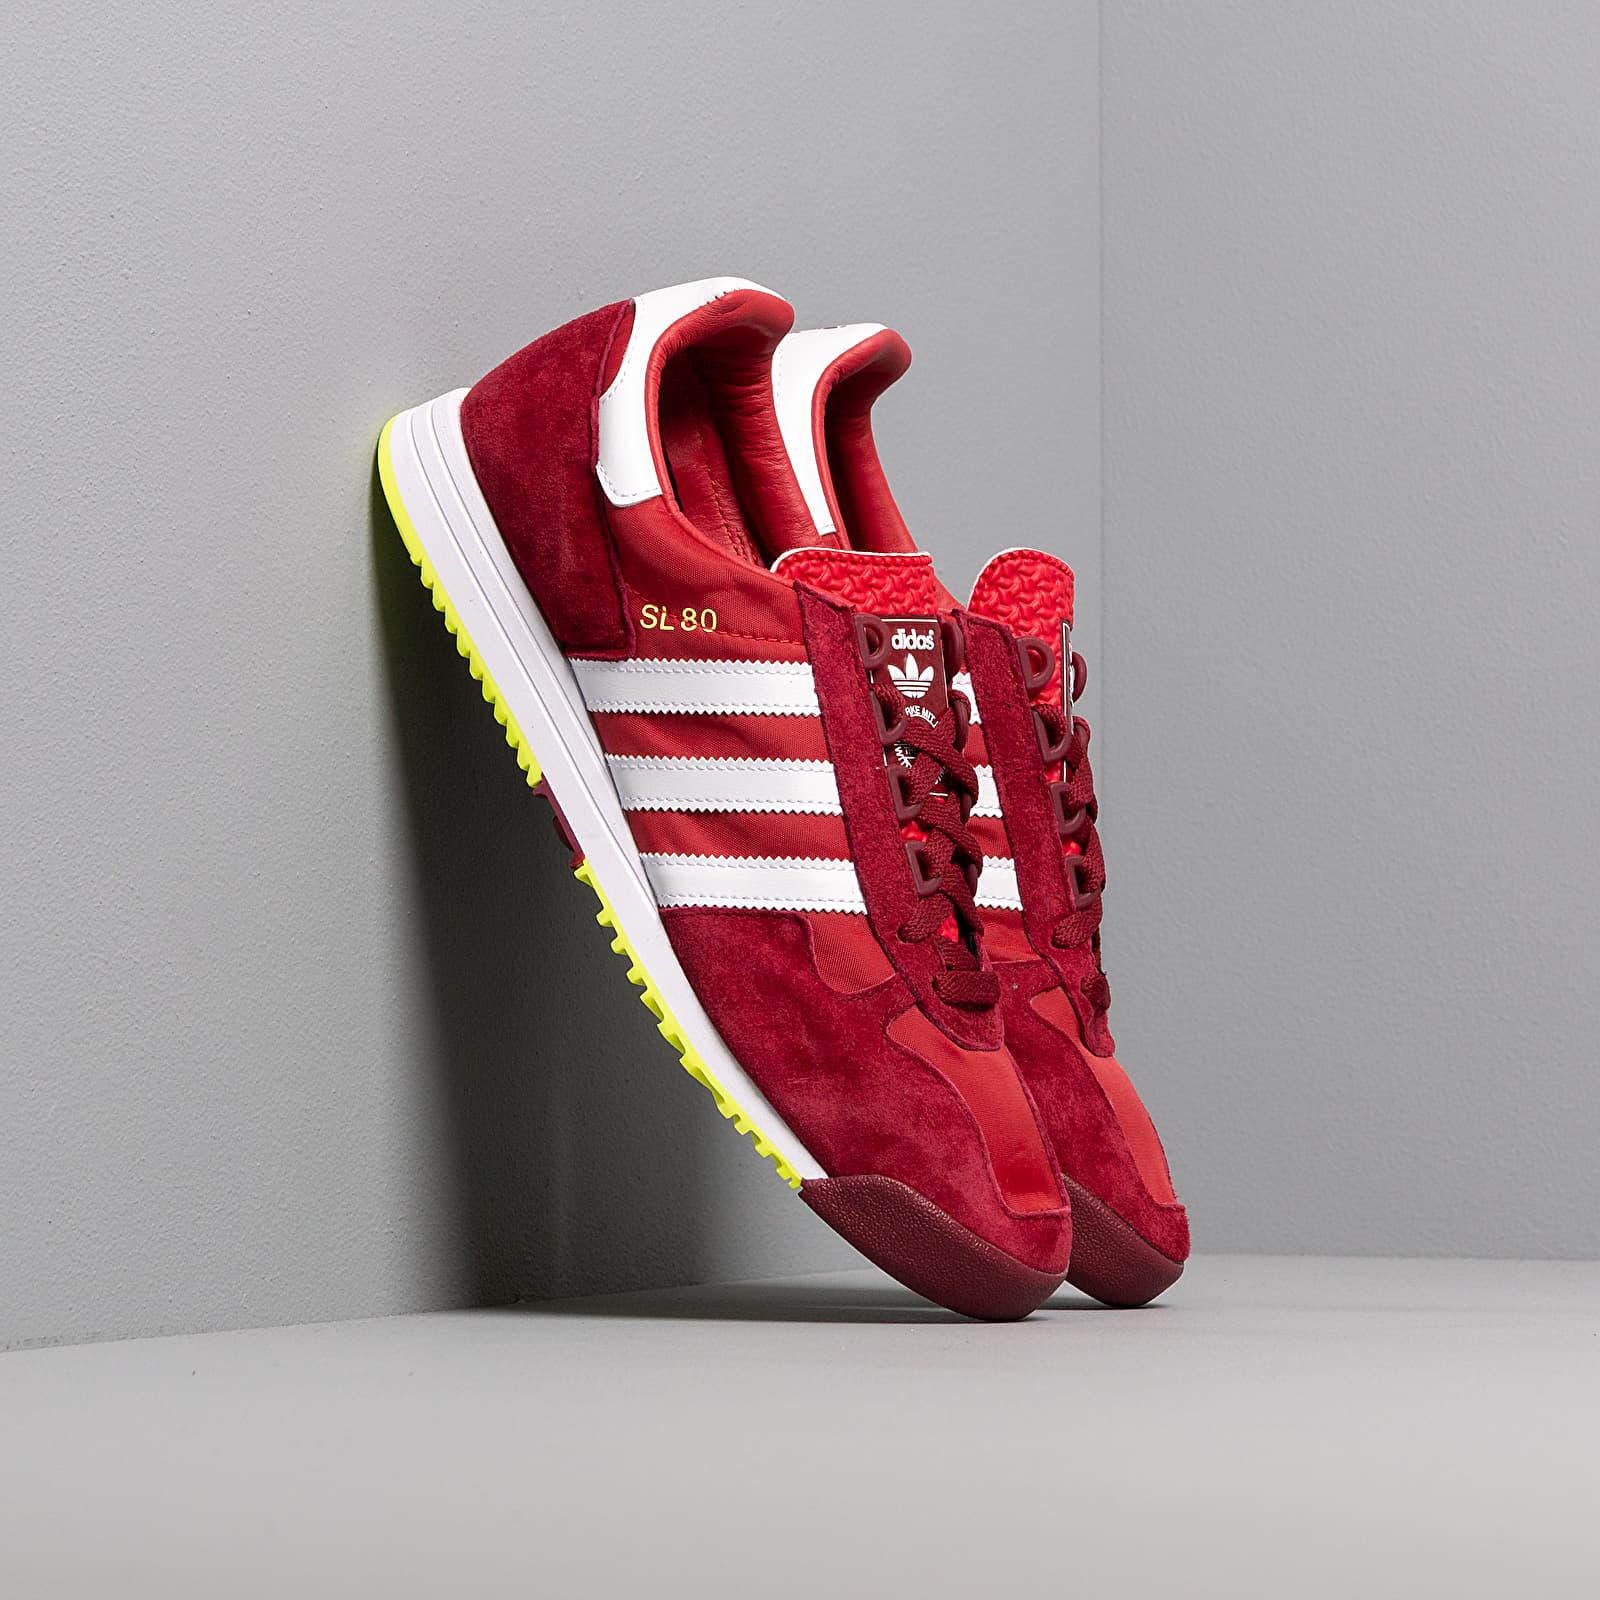 Men's shoes adidas SL 80 Scarlet/ Ftw White/ Core Burgundy